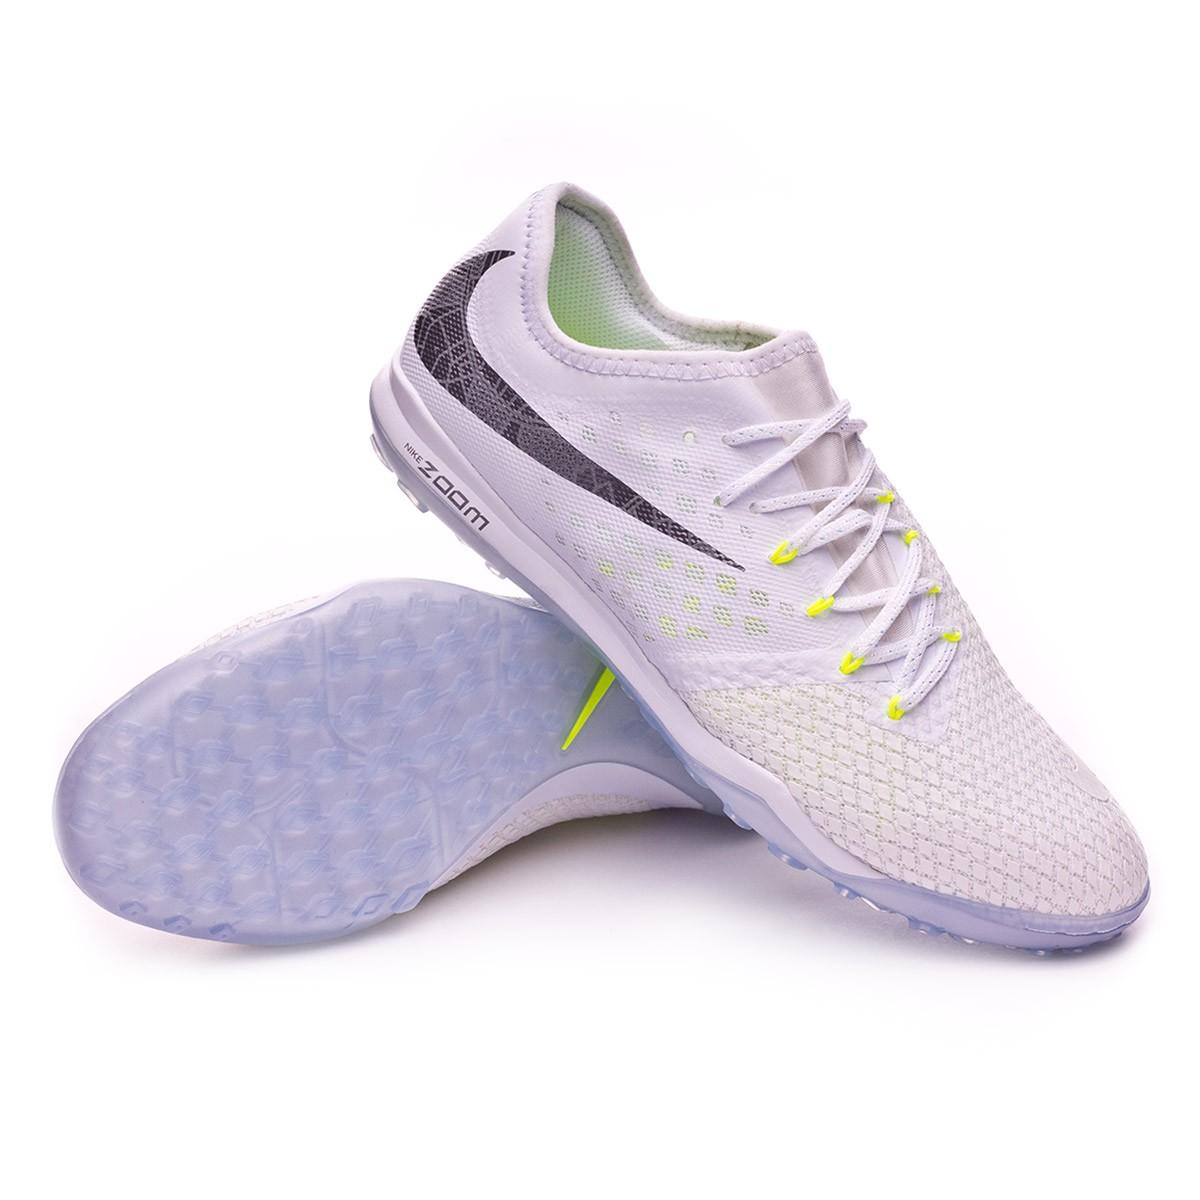 df7079386 ... australia football boot nike hypervenom zoom phantomx iii pro turf  white ed0e3 1c4c8